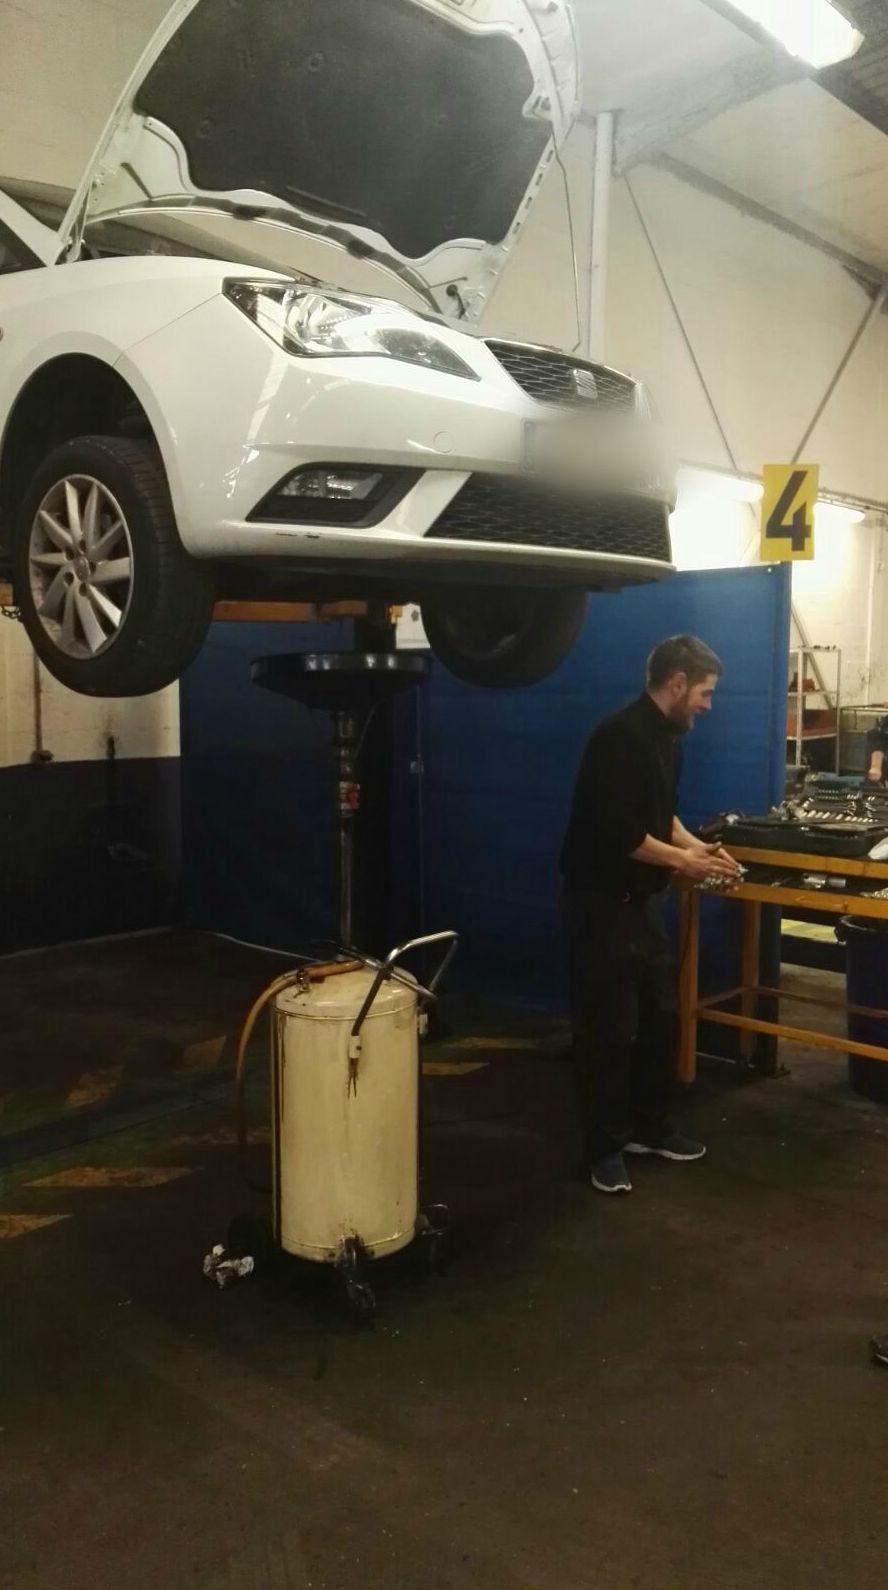 Reparación de coches en Zaragoza